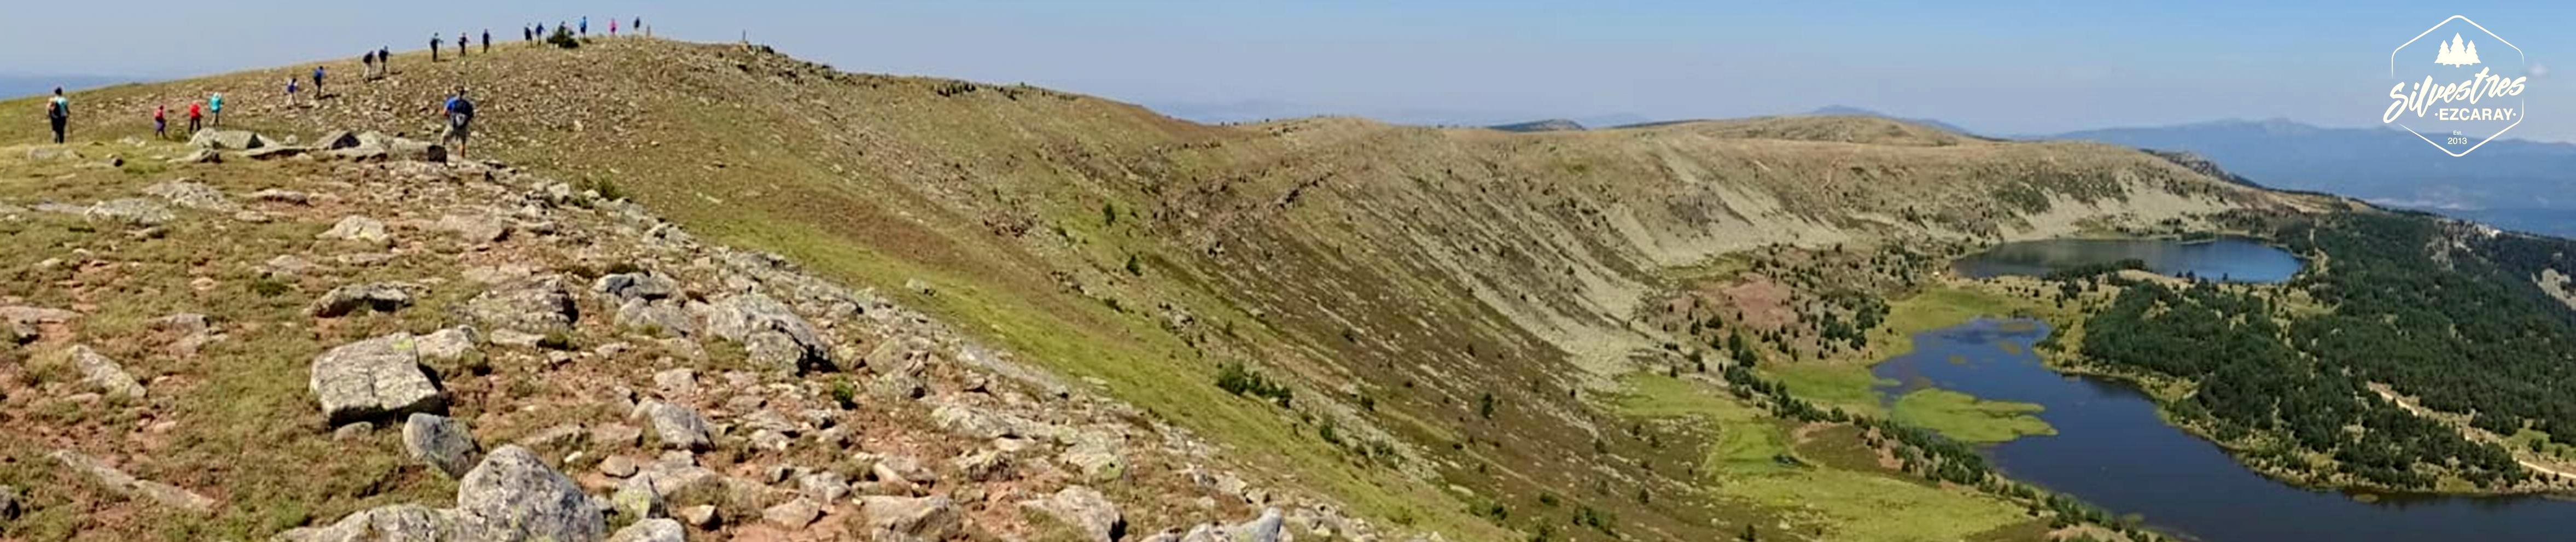 trekking_viajes_de_senderismo_naturaleza_burgos_parque_natural_lagunas_neila